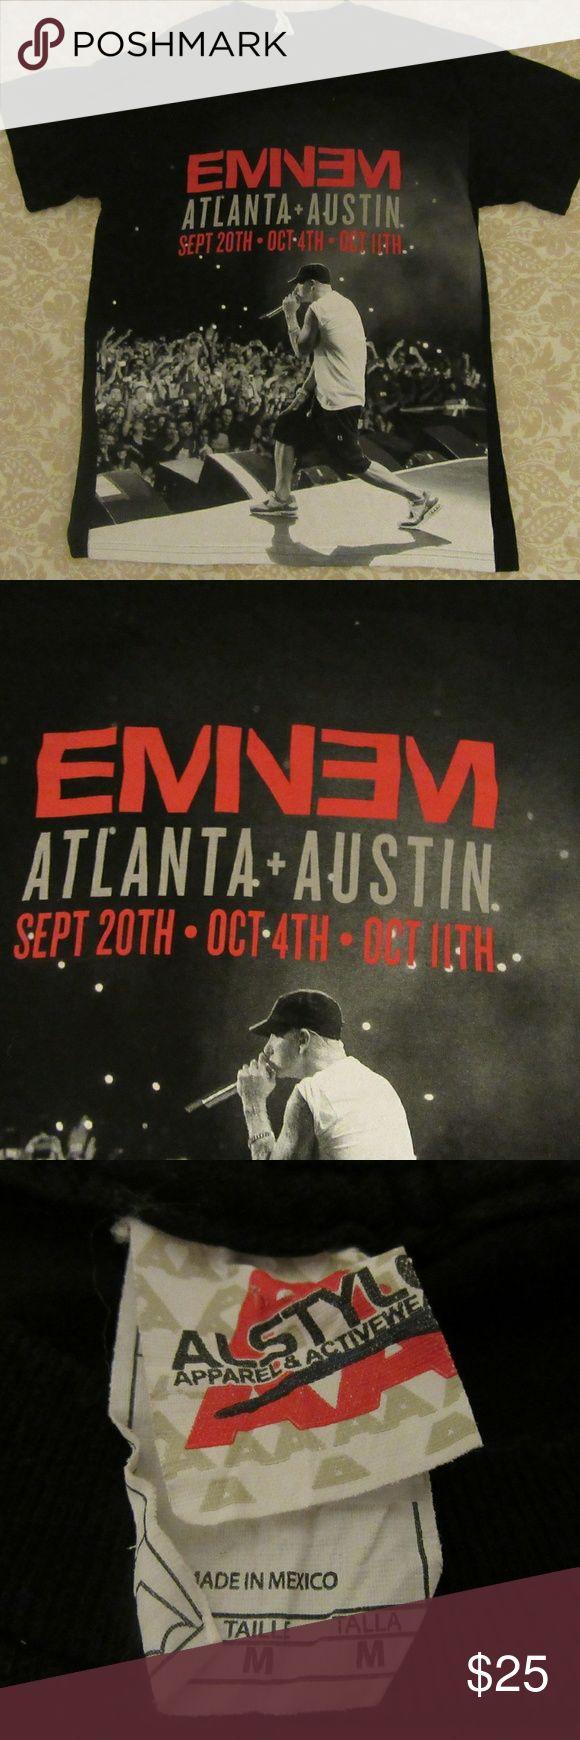 Eminem 2014 Concert Tour Atx Atl tee M great shape  Eminem 2014 Concert Tour Austin Texas Atlanta Georgia Black T-Shirt Medium   pit to pit 18.5  shoulder to shoulder 18.5  top to bottom 27  ? Shirts Tees - Short Sleeve